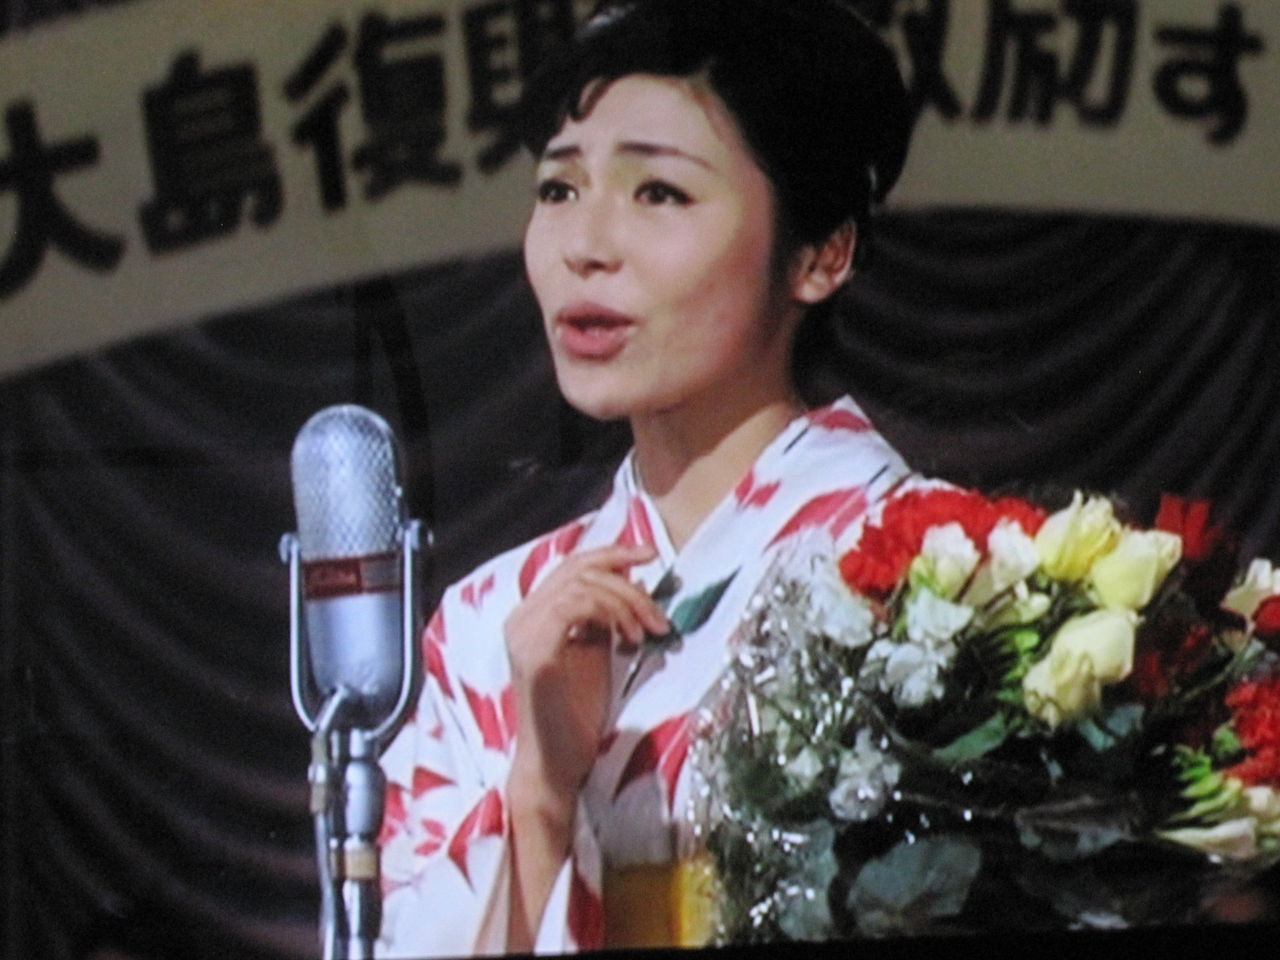 香山美子 (女優)の画像 p1_37